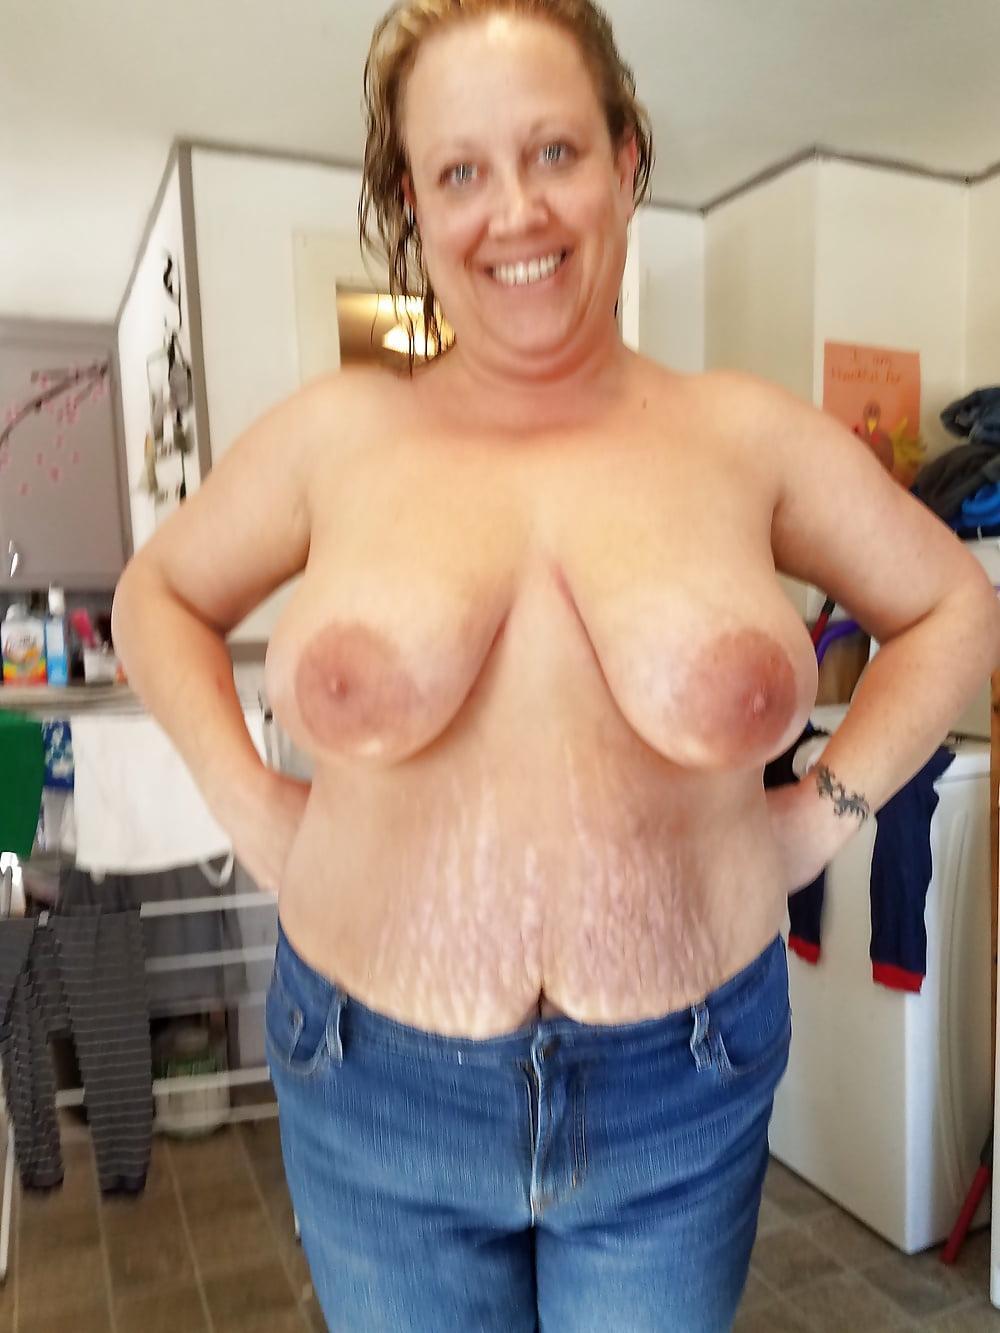 Pleasemelaterr88 from Victoria,Australia